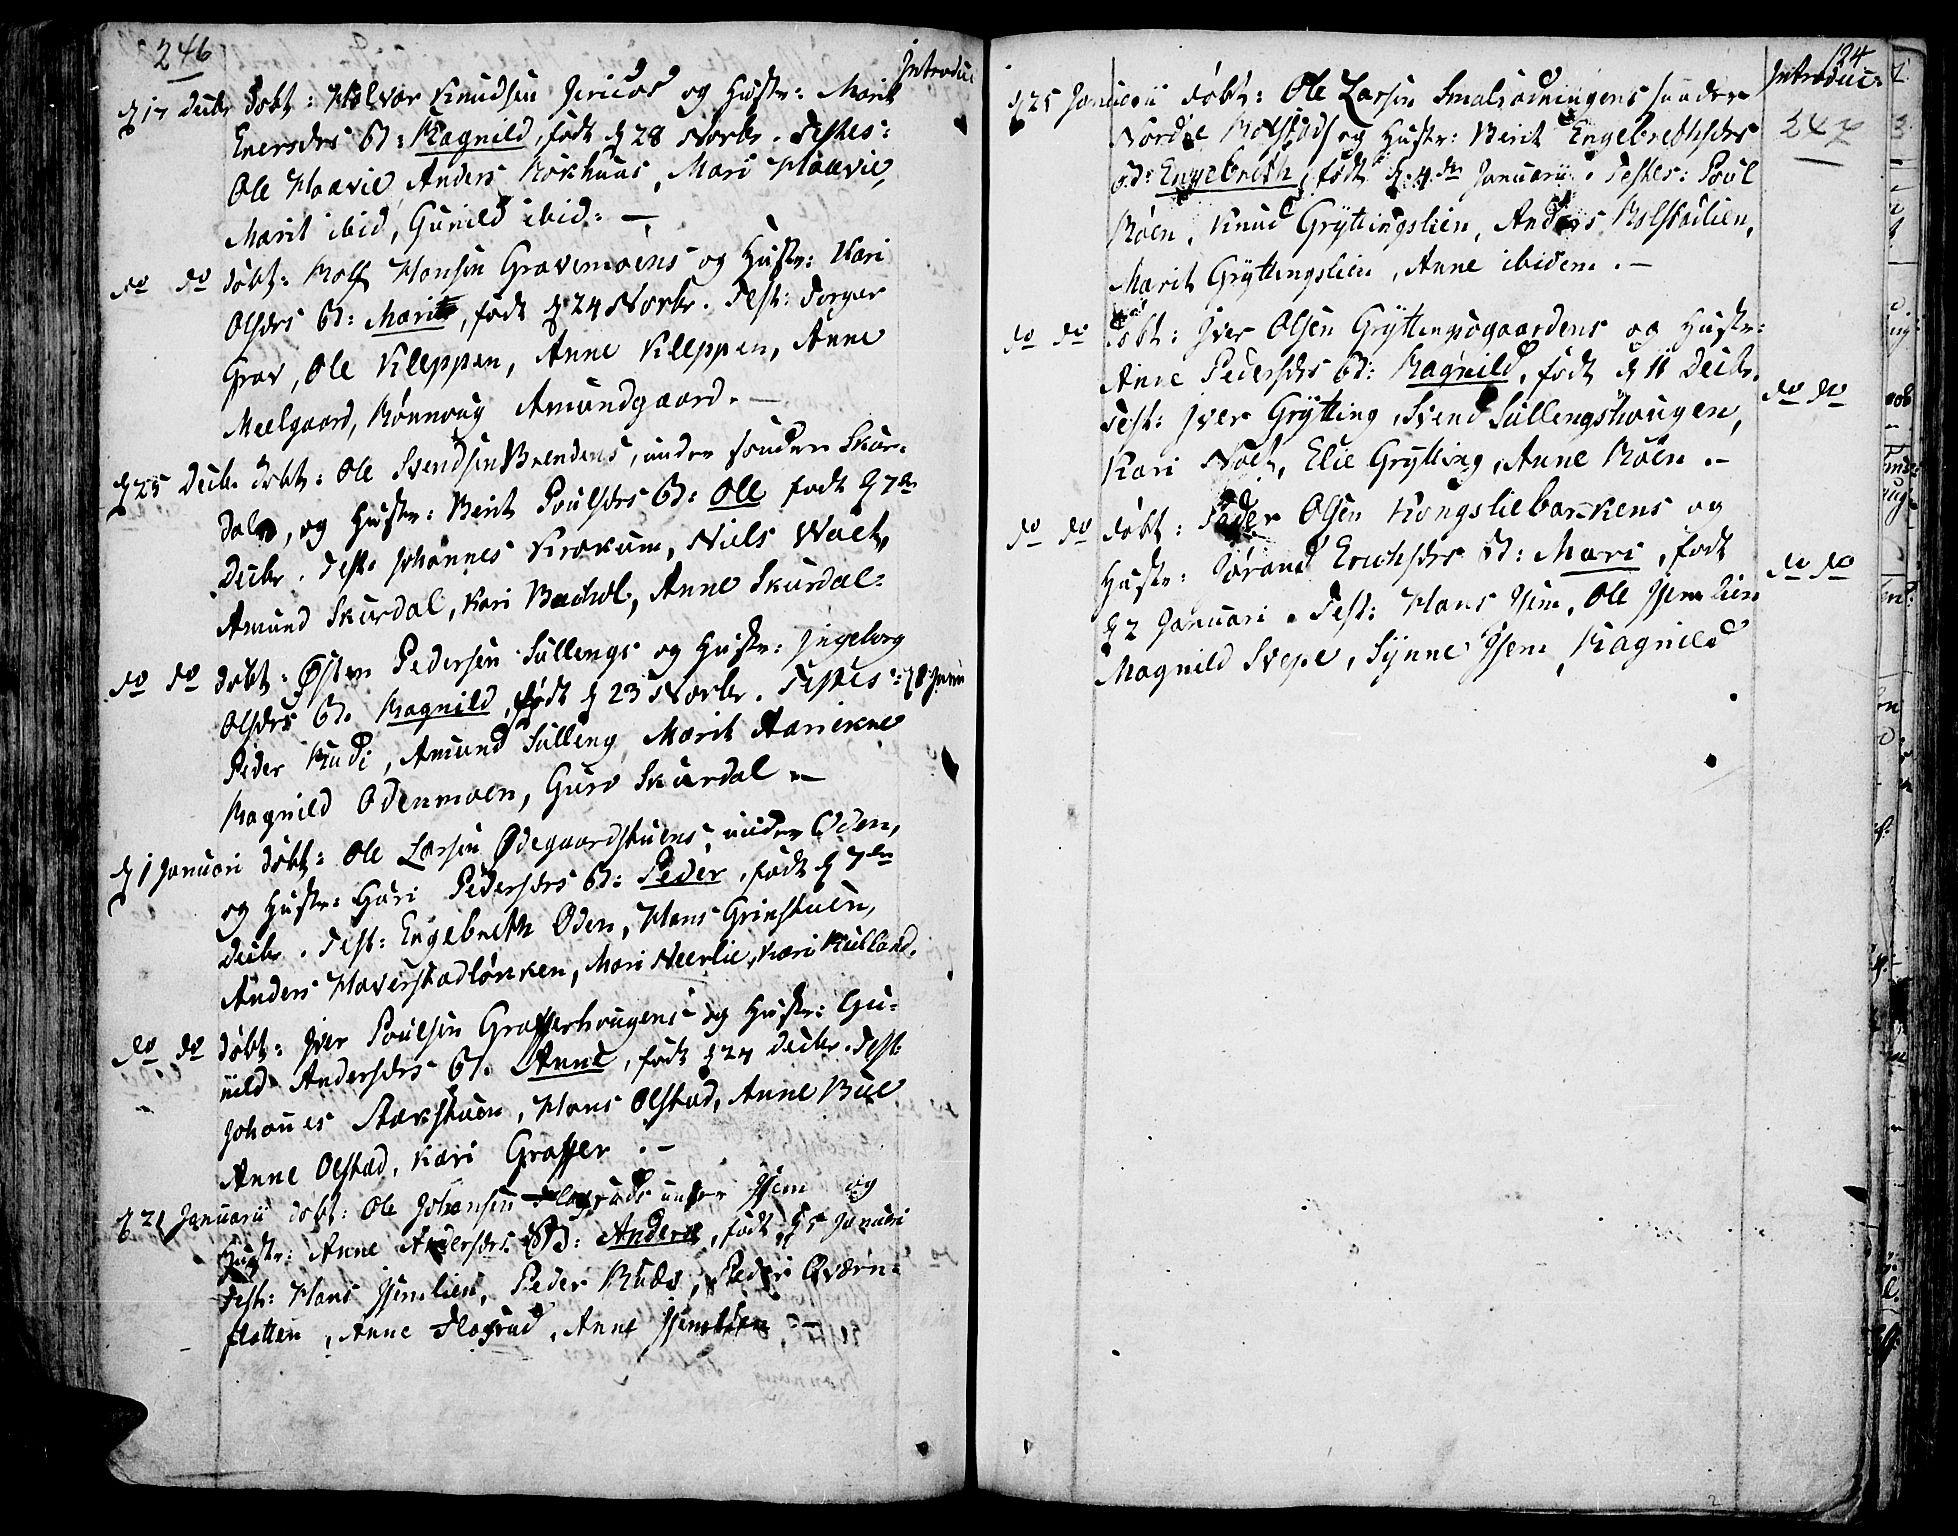 SAH, Fron prestekontor, H/Ha/Haa/L0001: Ministerialbok nr. 1, 1799-1816, s. 246-247